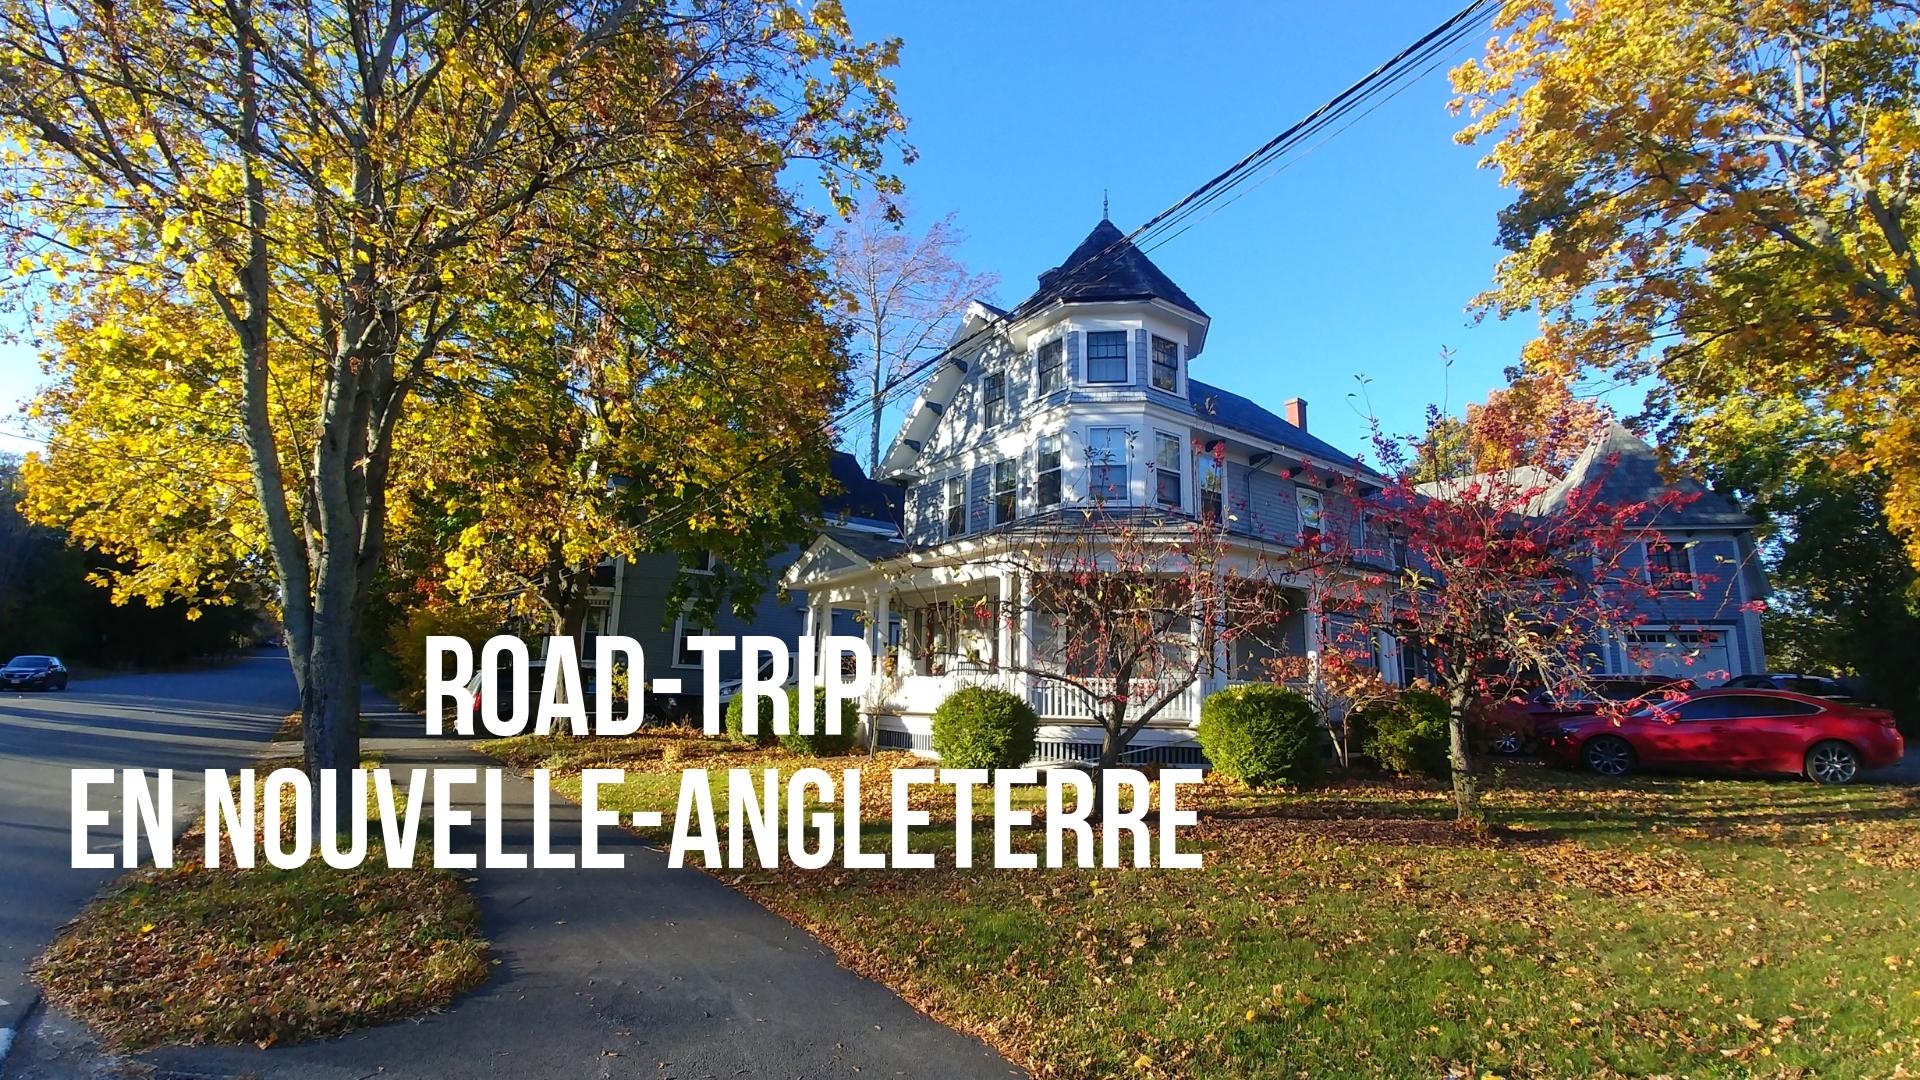 road-trip nouvelle-angleterre salem boston bangor octobre halloween blog voyage arpenter le chemin